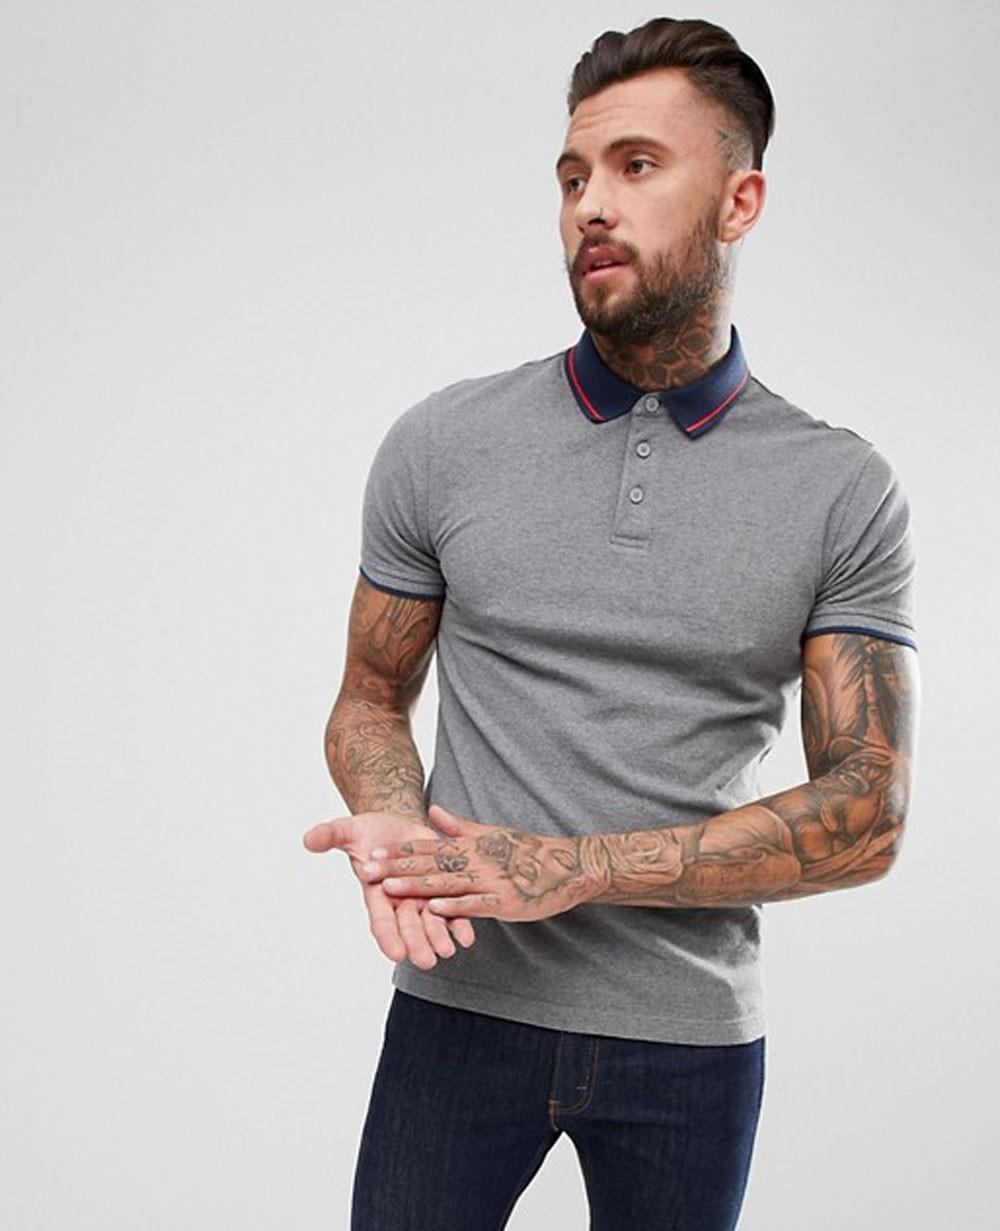 b30ccada Men Grey Longline Muscle Polo Shirt With Curved Hem Tee